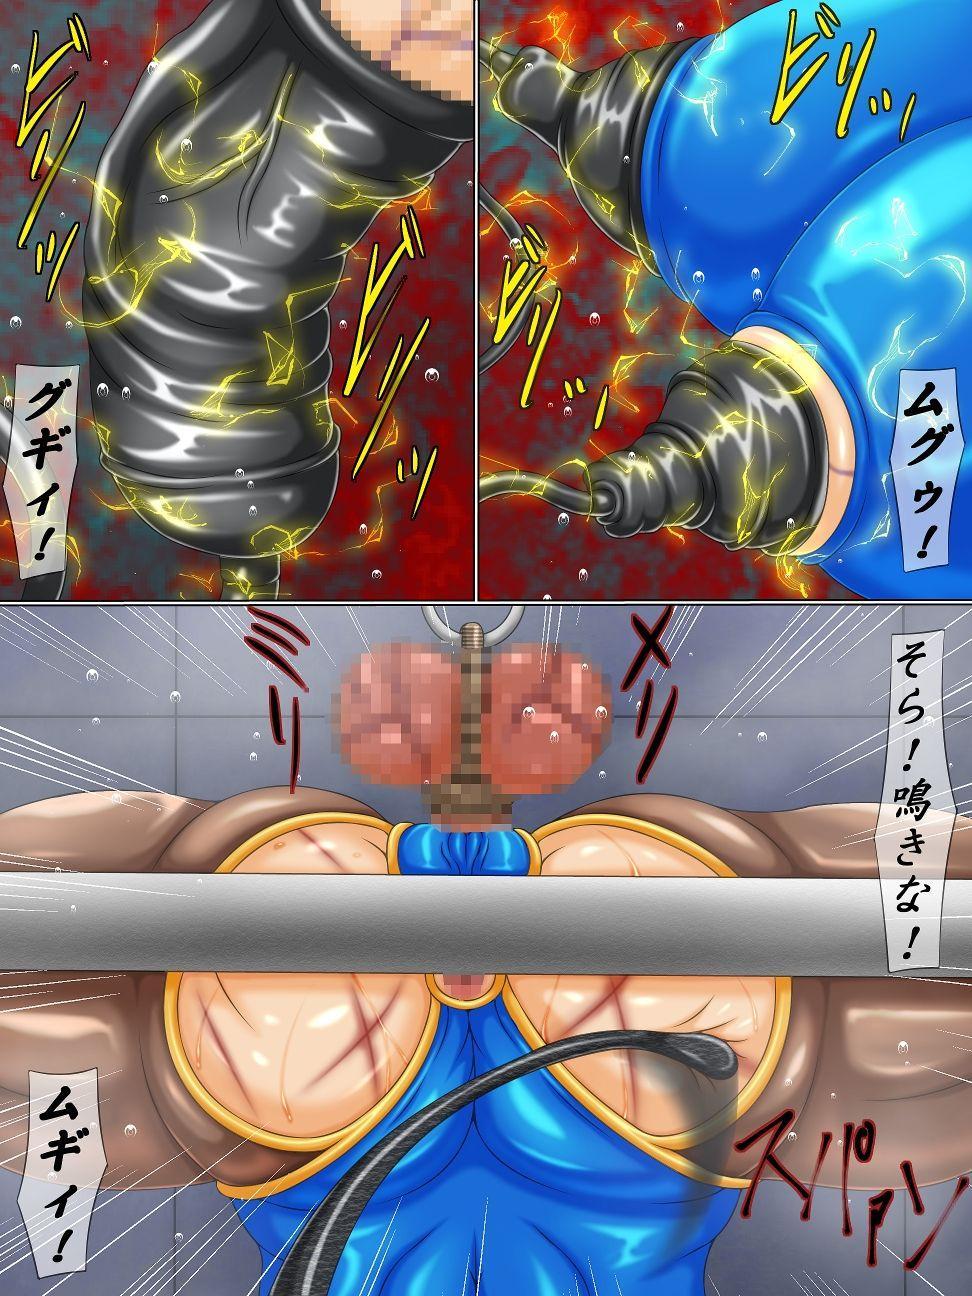 Goumon Rengoku F2 Kouhen Jinkaku Hakai Kachiku Lesson 18